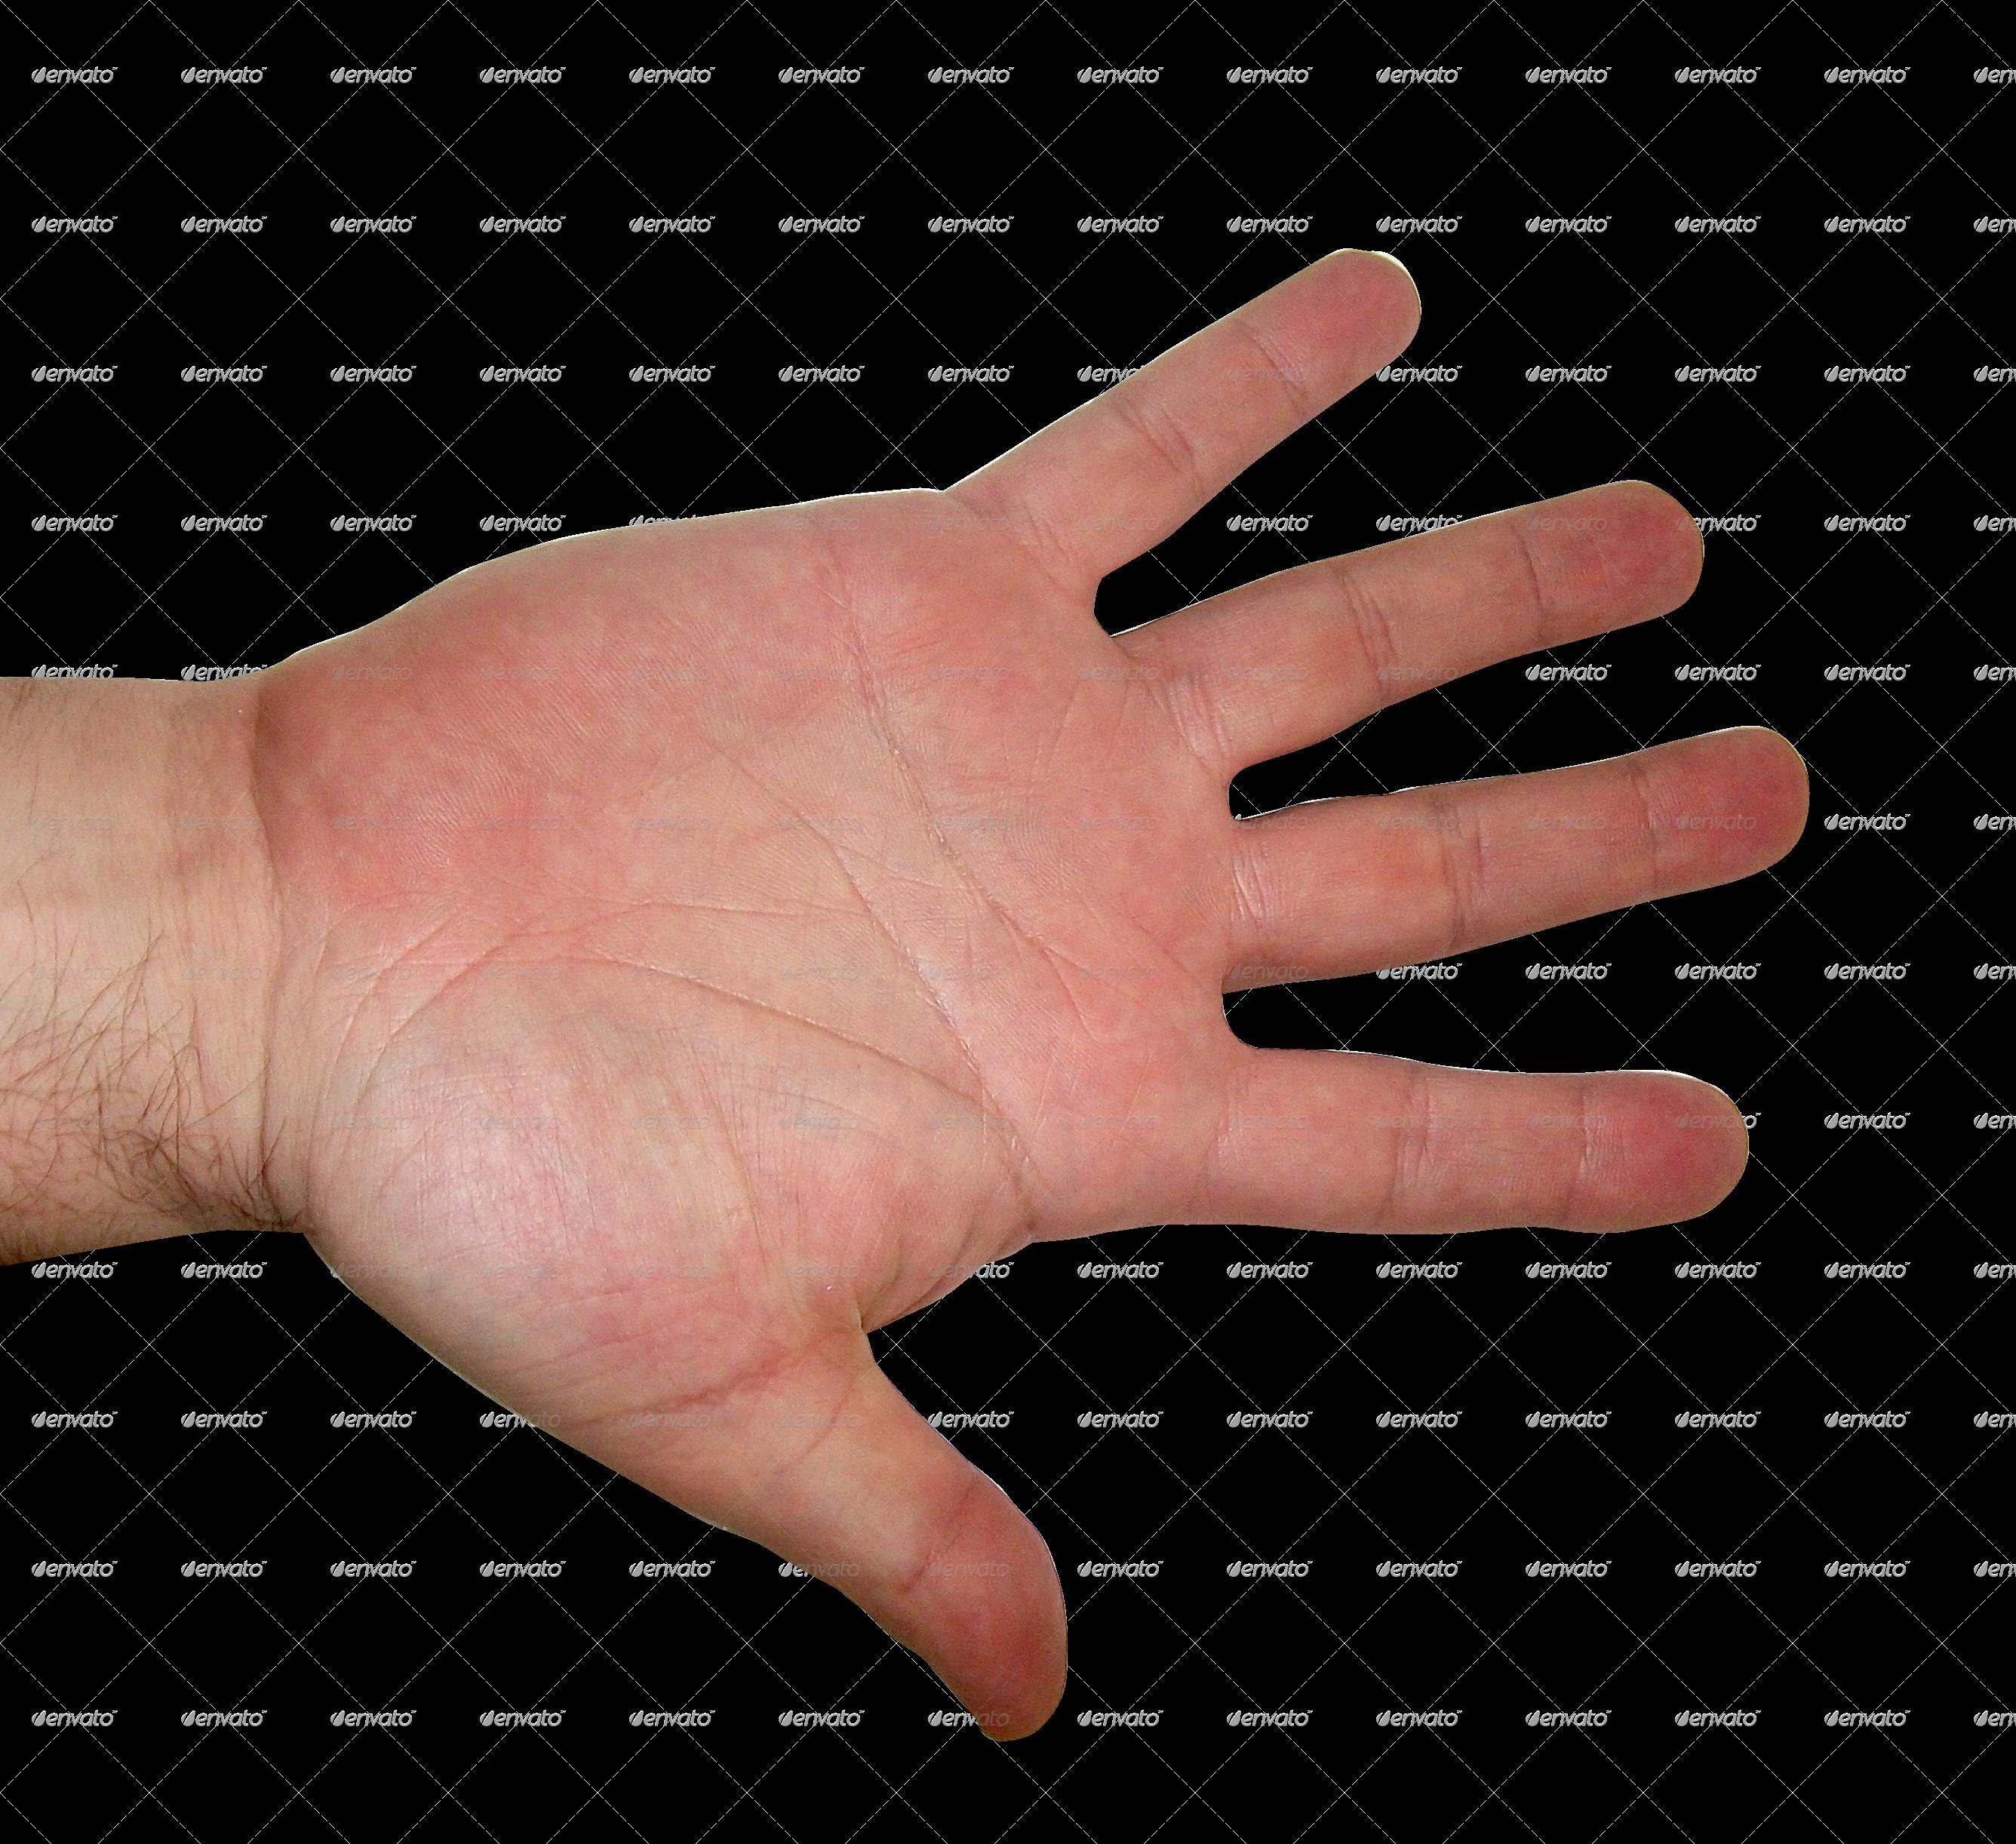 Textures by chandank docean. Hands clipart human hand